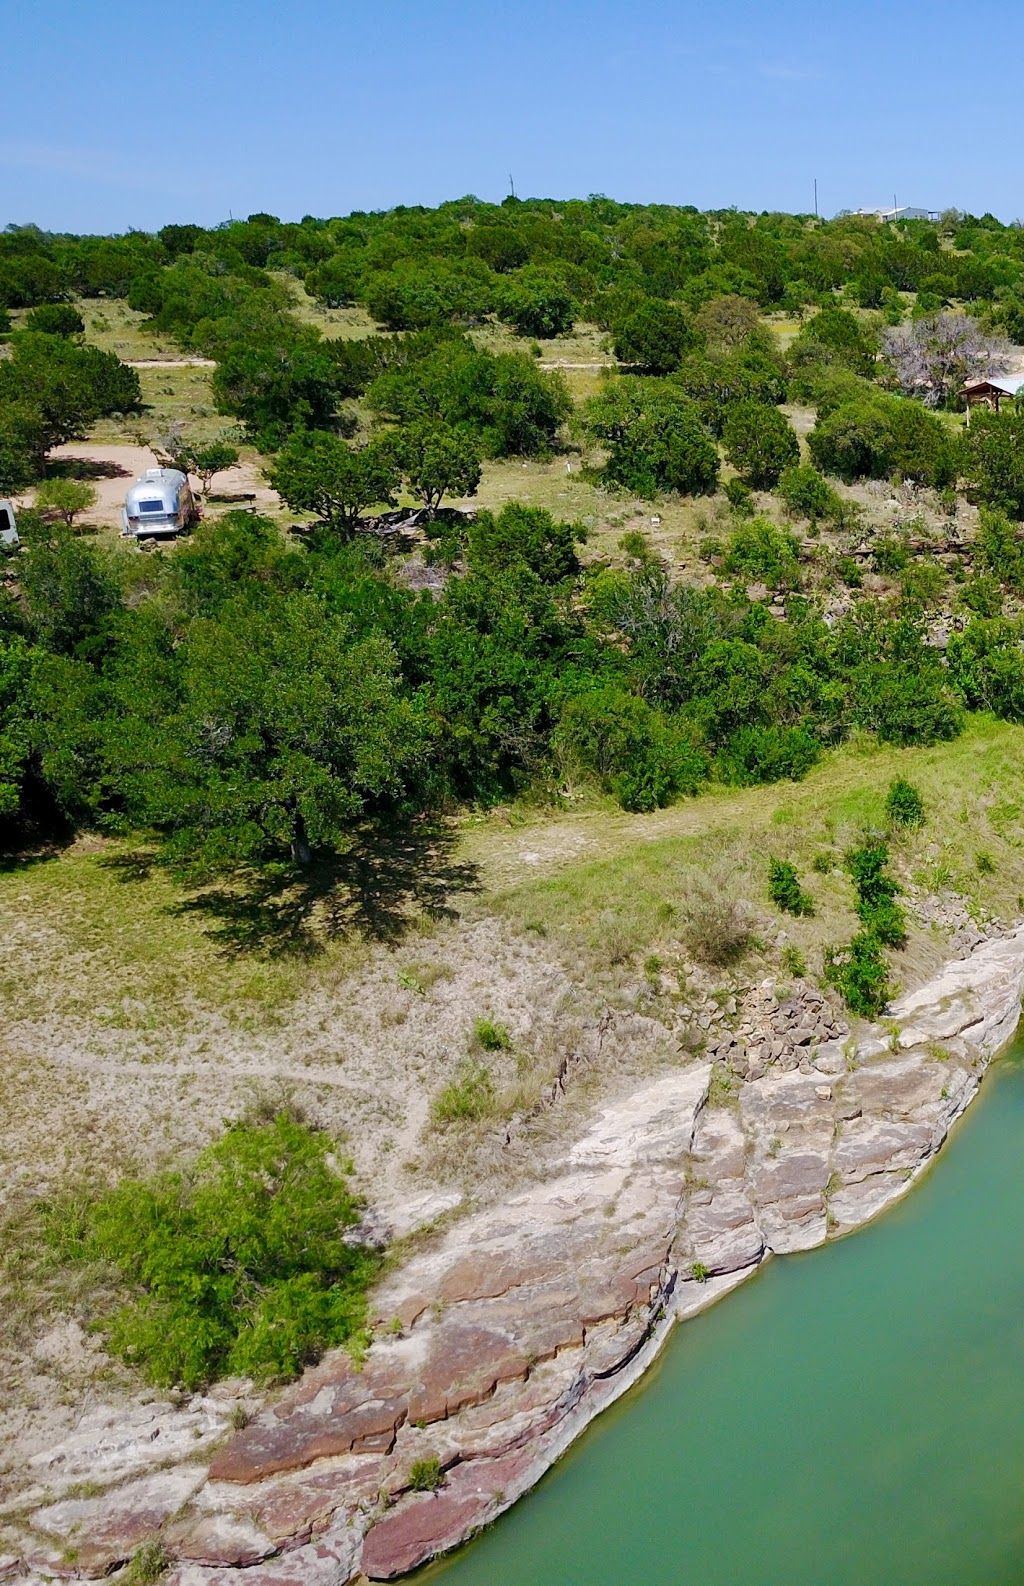 Dos Rios RV Park - lodging  | Photo 9 of 10 | Address: 4500 Dos Rios Trail, Mason, TX 76856, USA | Phone: (325) 347-1713